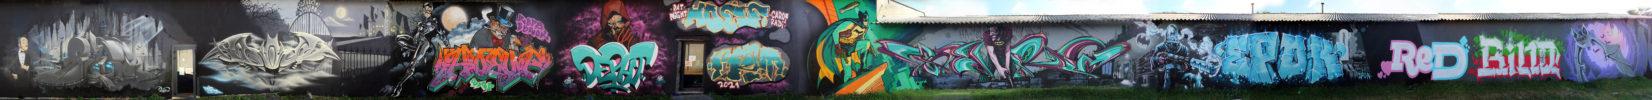 fresque-hd-finale-web